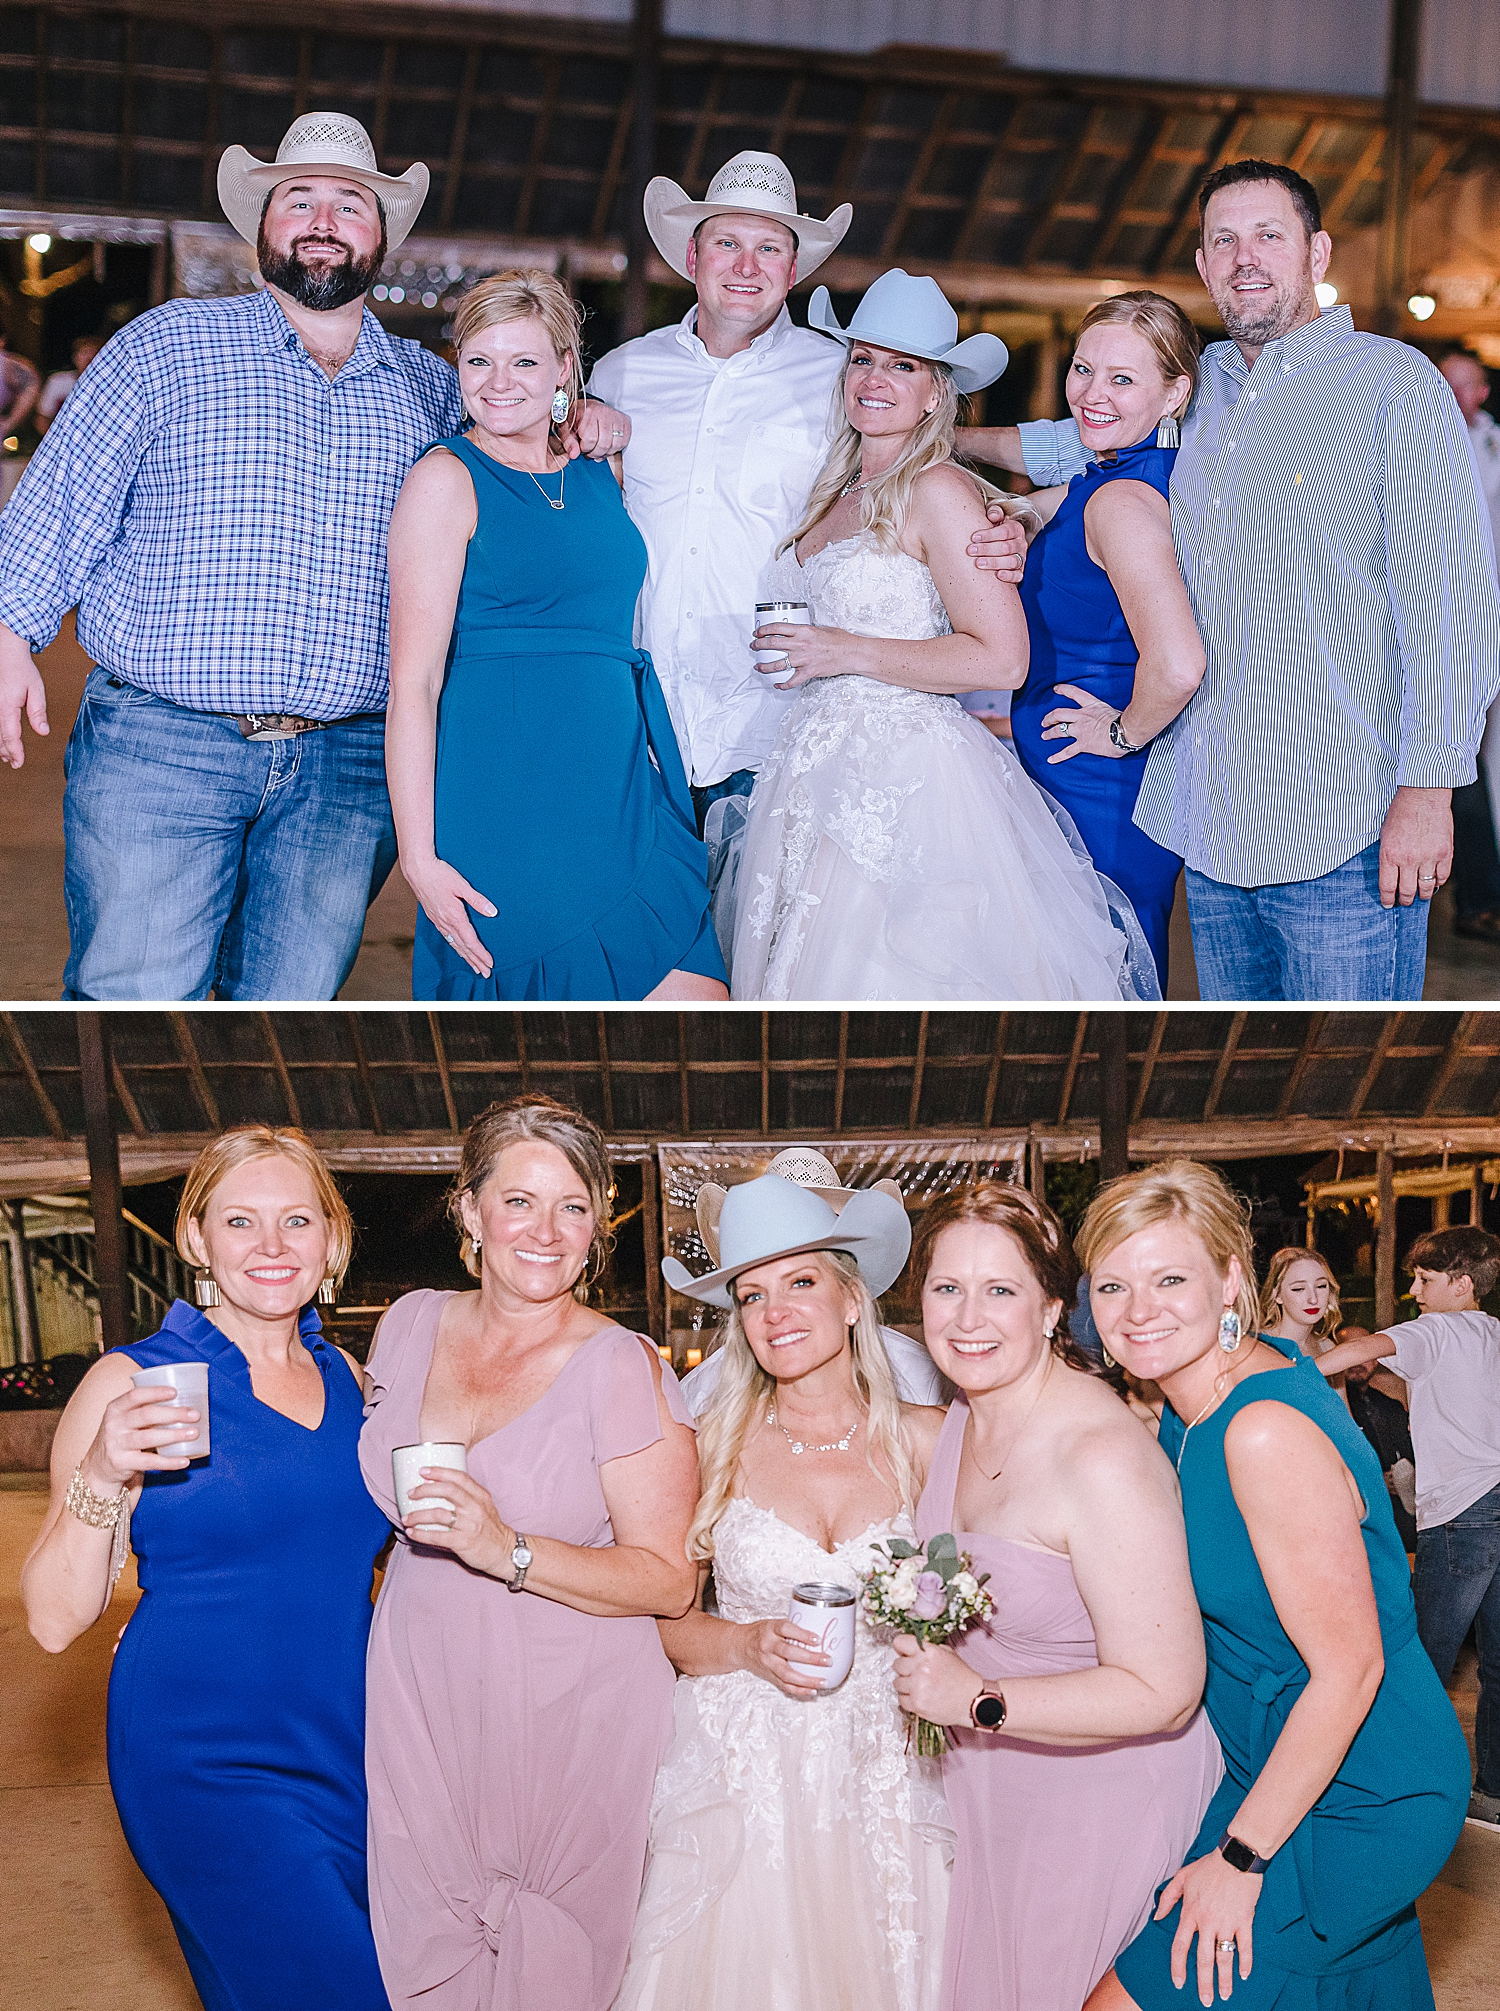 Rio-Cibilo-Ranch-Marion-Texas-Wedding-Rustic-Blush-Rose-Quartz-Details-Carly-Barton-Photography_0088.jpg